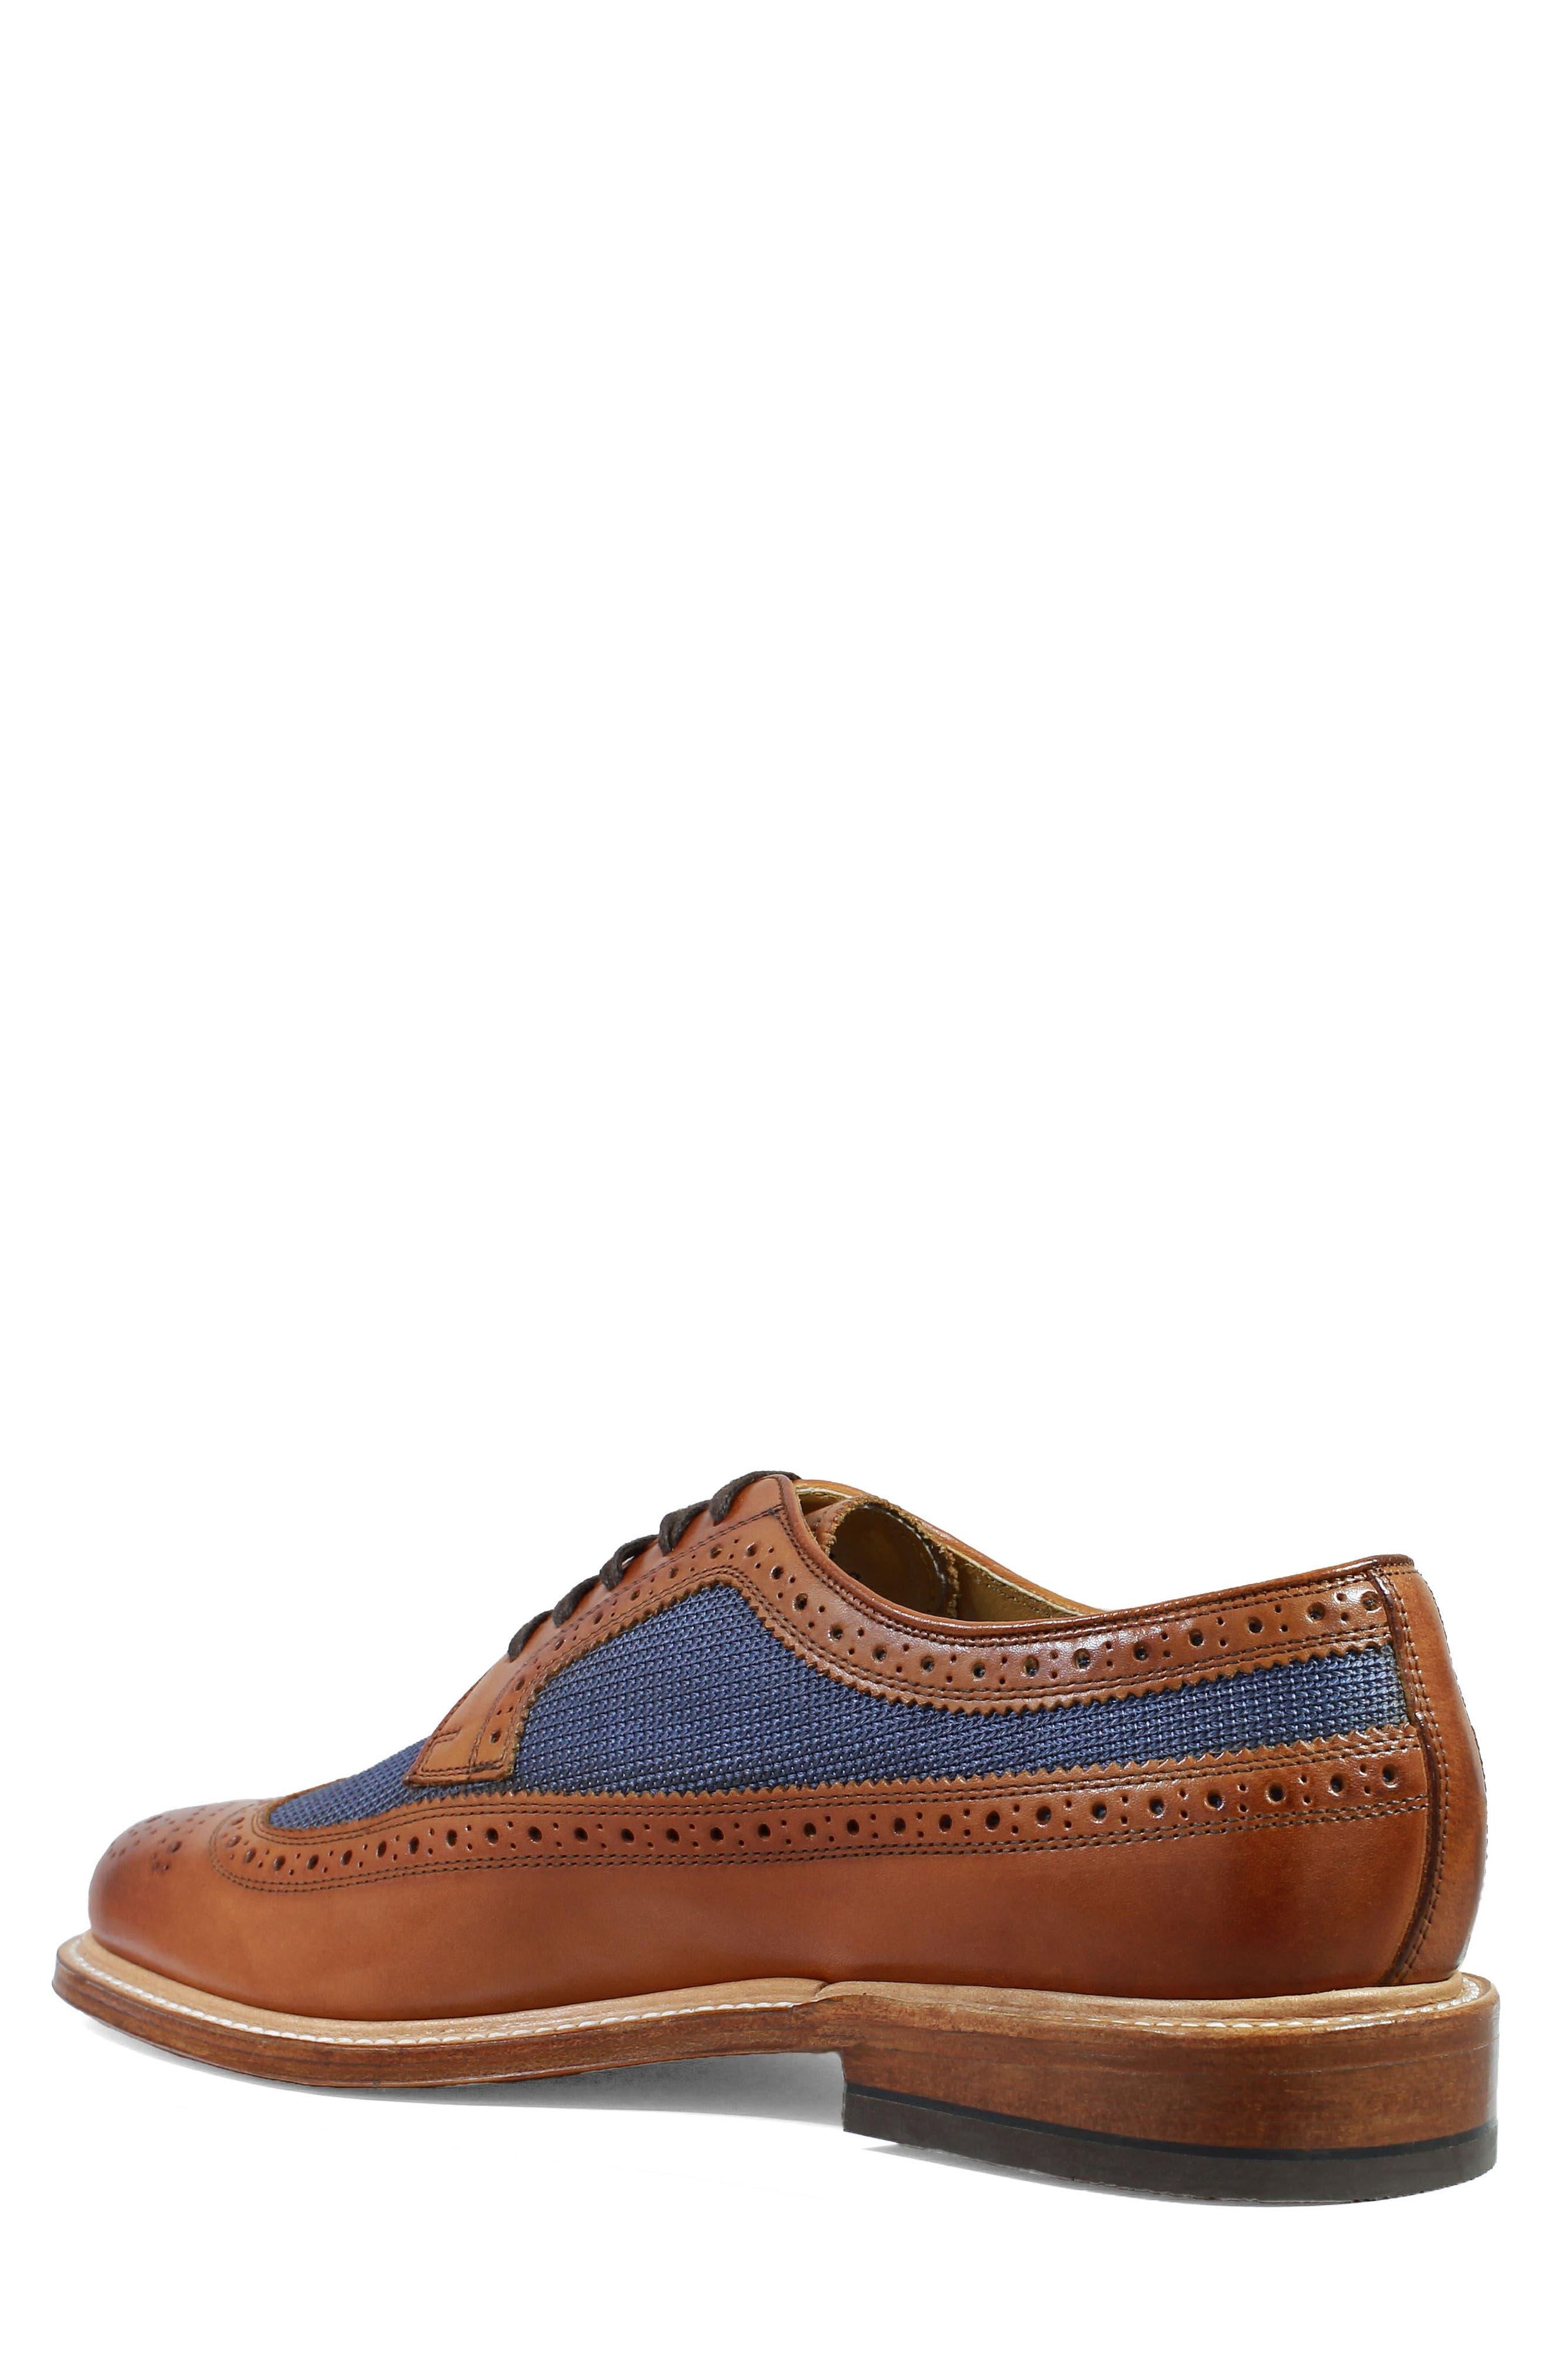 'Heritage' Wingtip,                             Alternate thumbnail 2, color,                             Cognac Leather/ Mesh